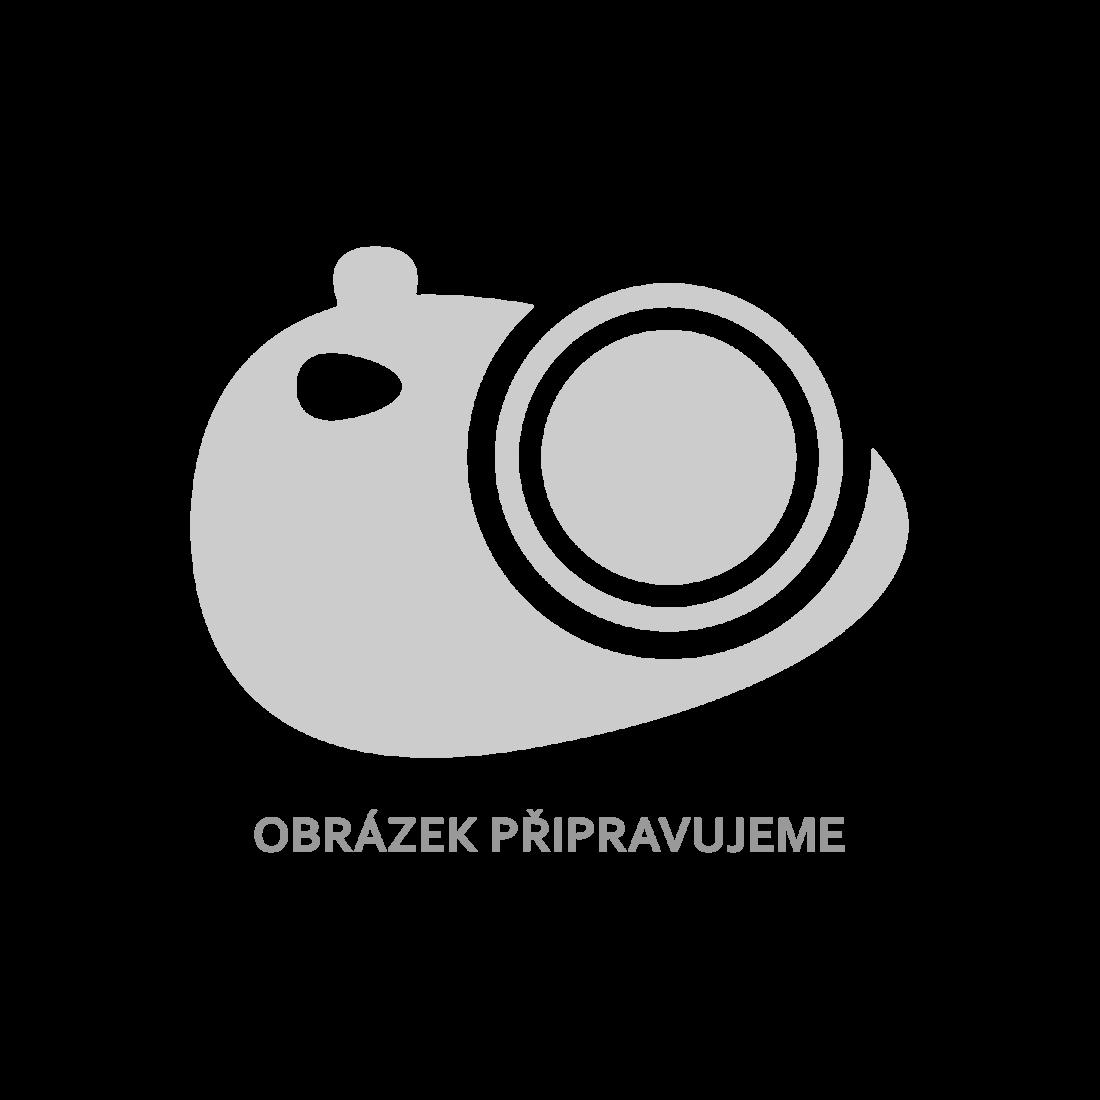 vidaXL Ručně pletený sedací puf tmavě šedo-bílý 50 x 35 cm vlna [287605]